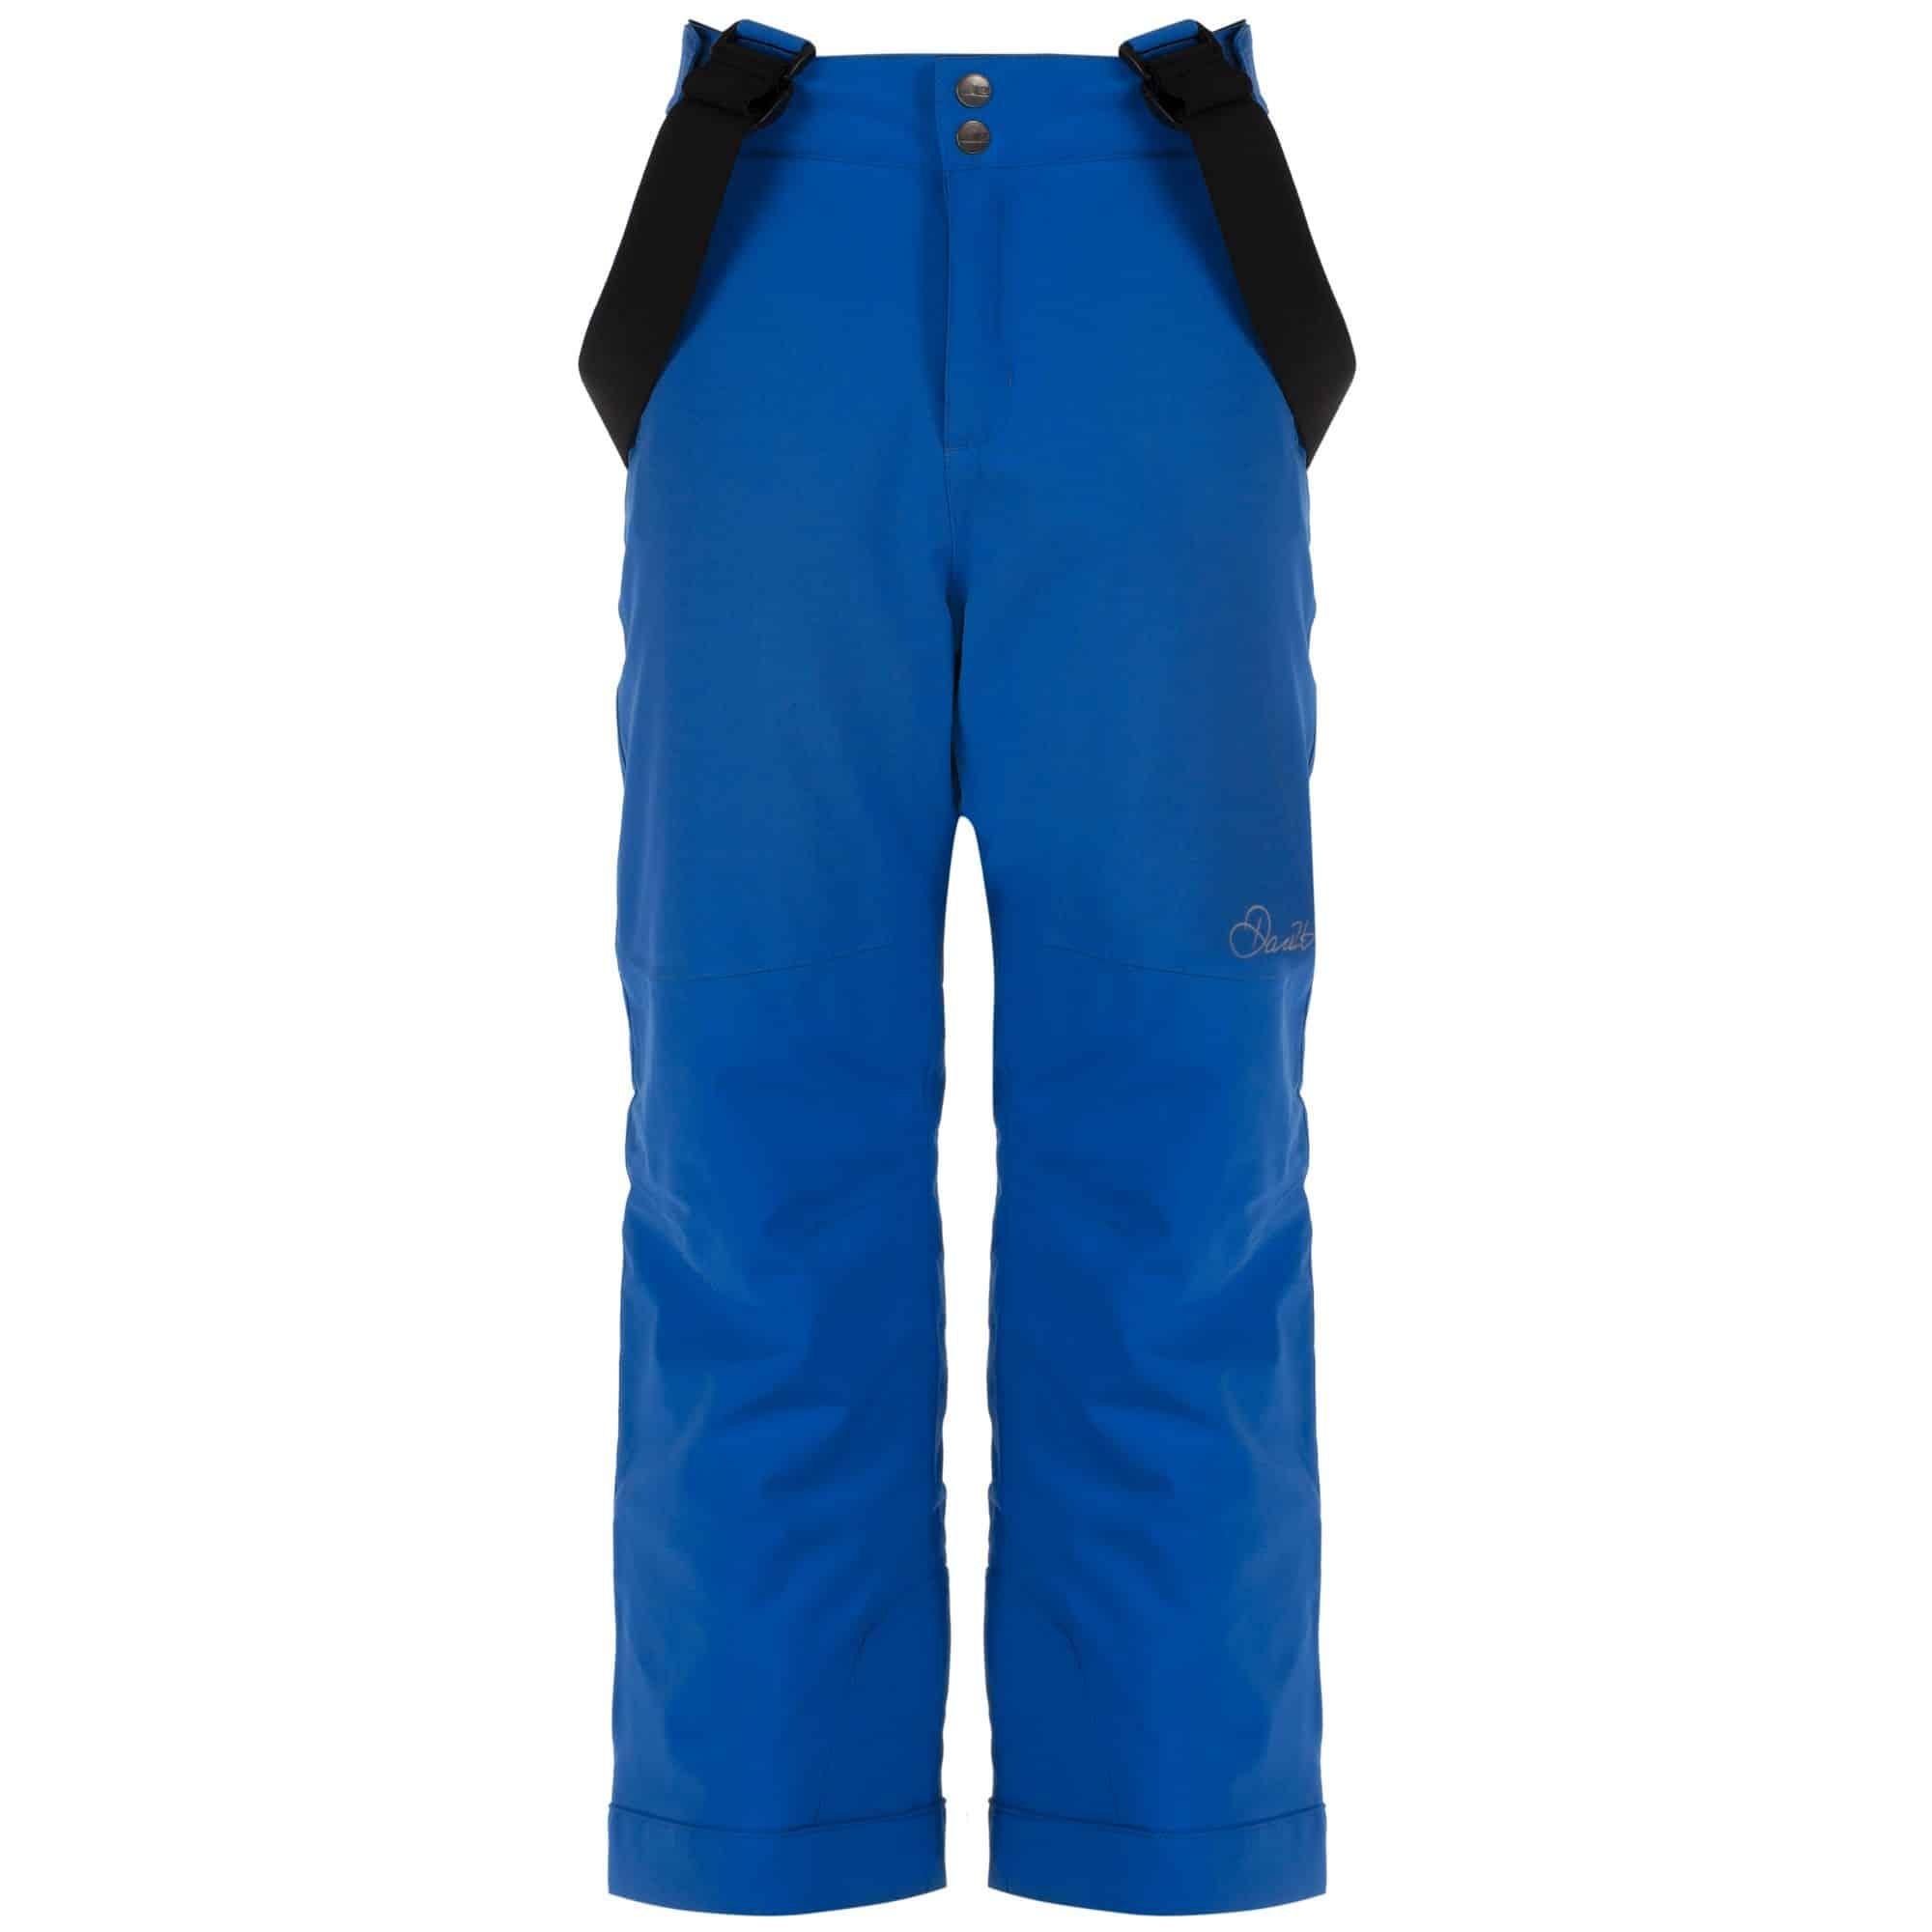 take on oxford blue braces front